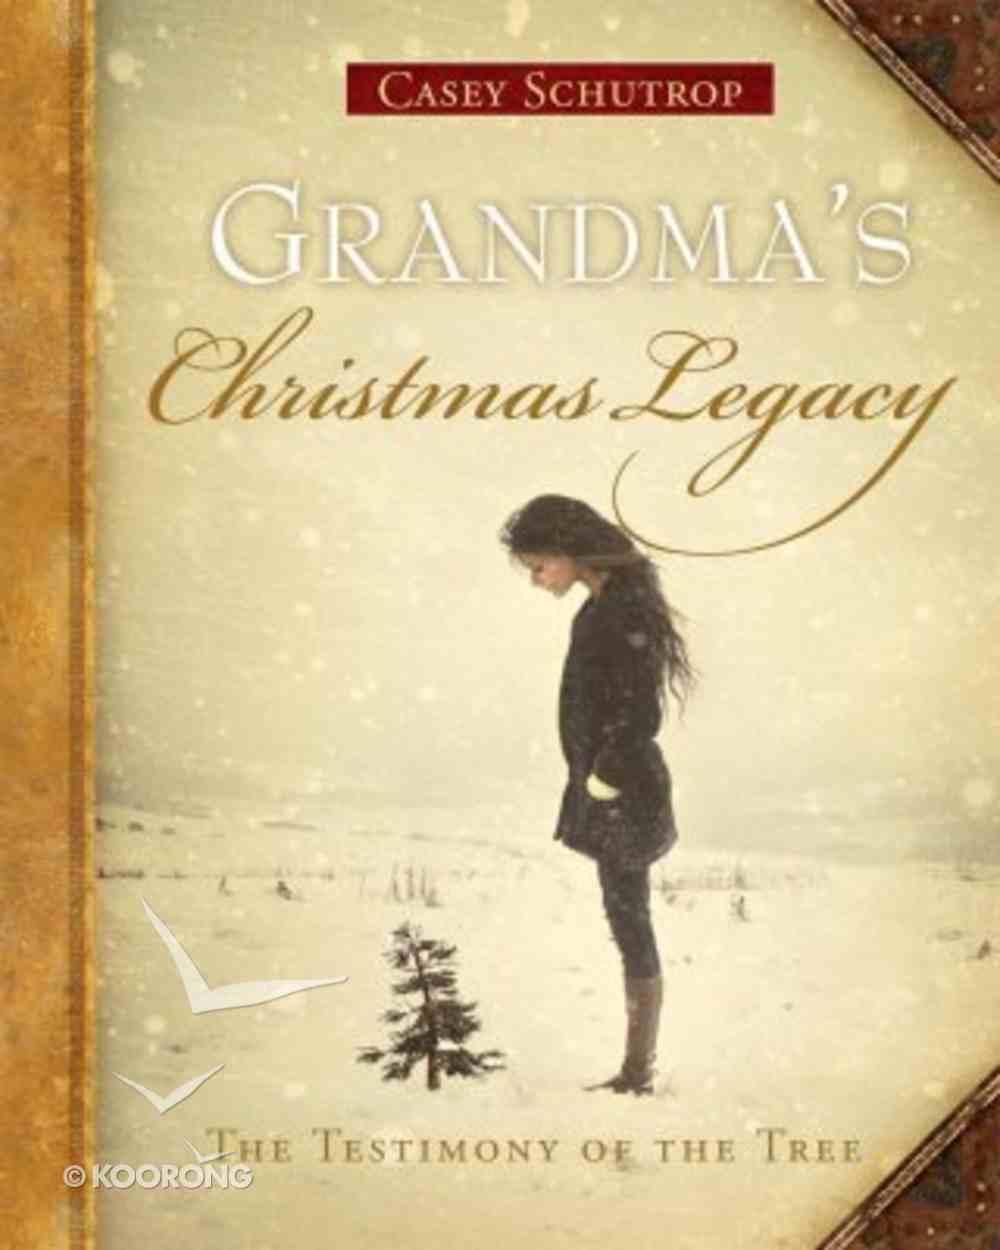 Grandma's Christmas Legacy, the Testimony of the Tree Hardback